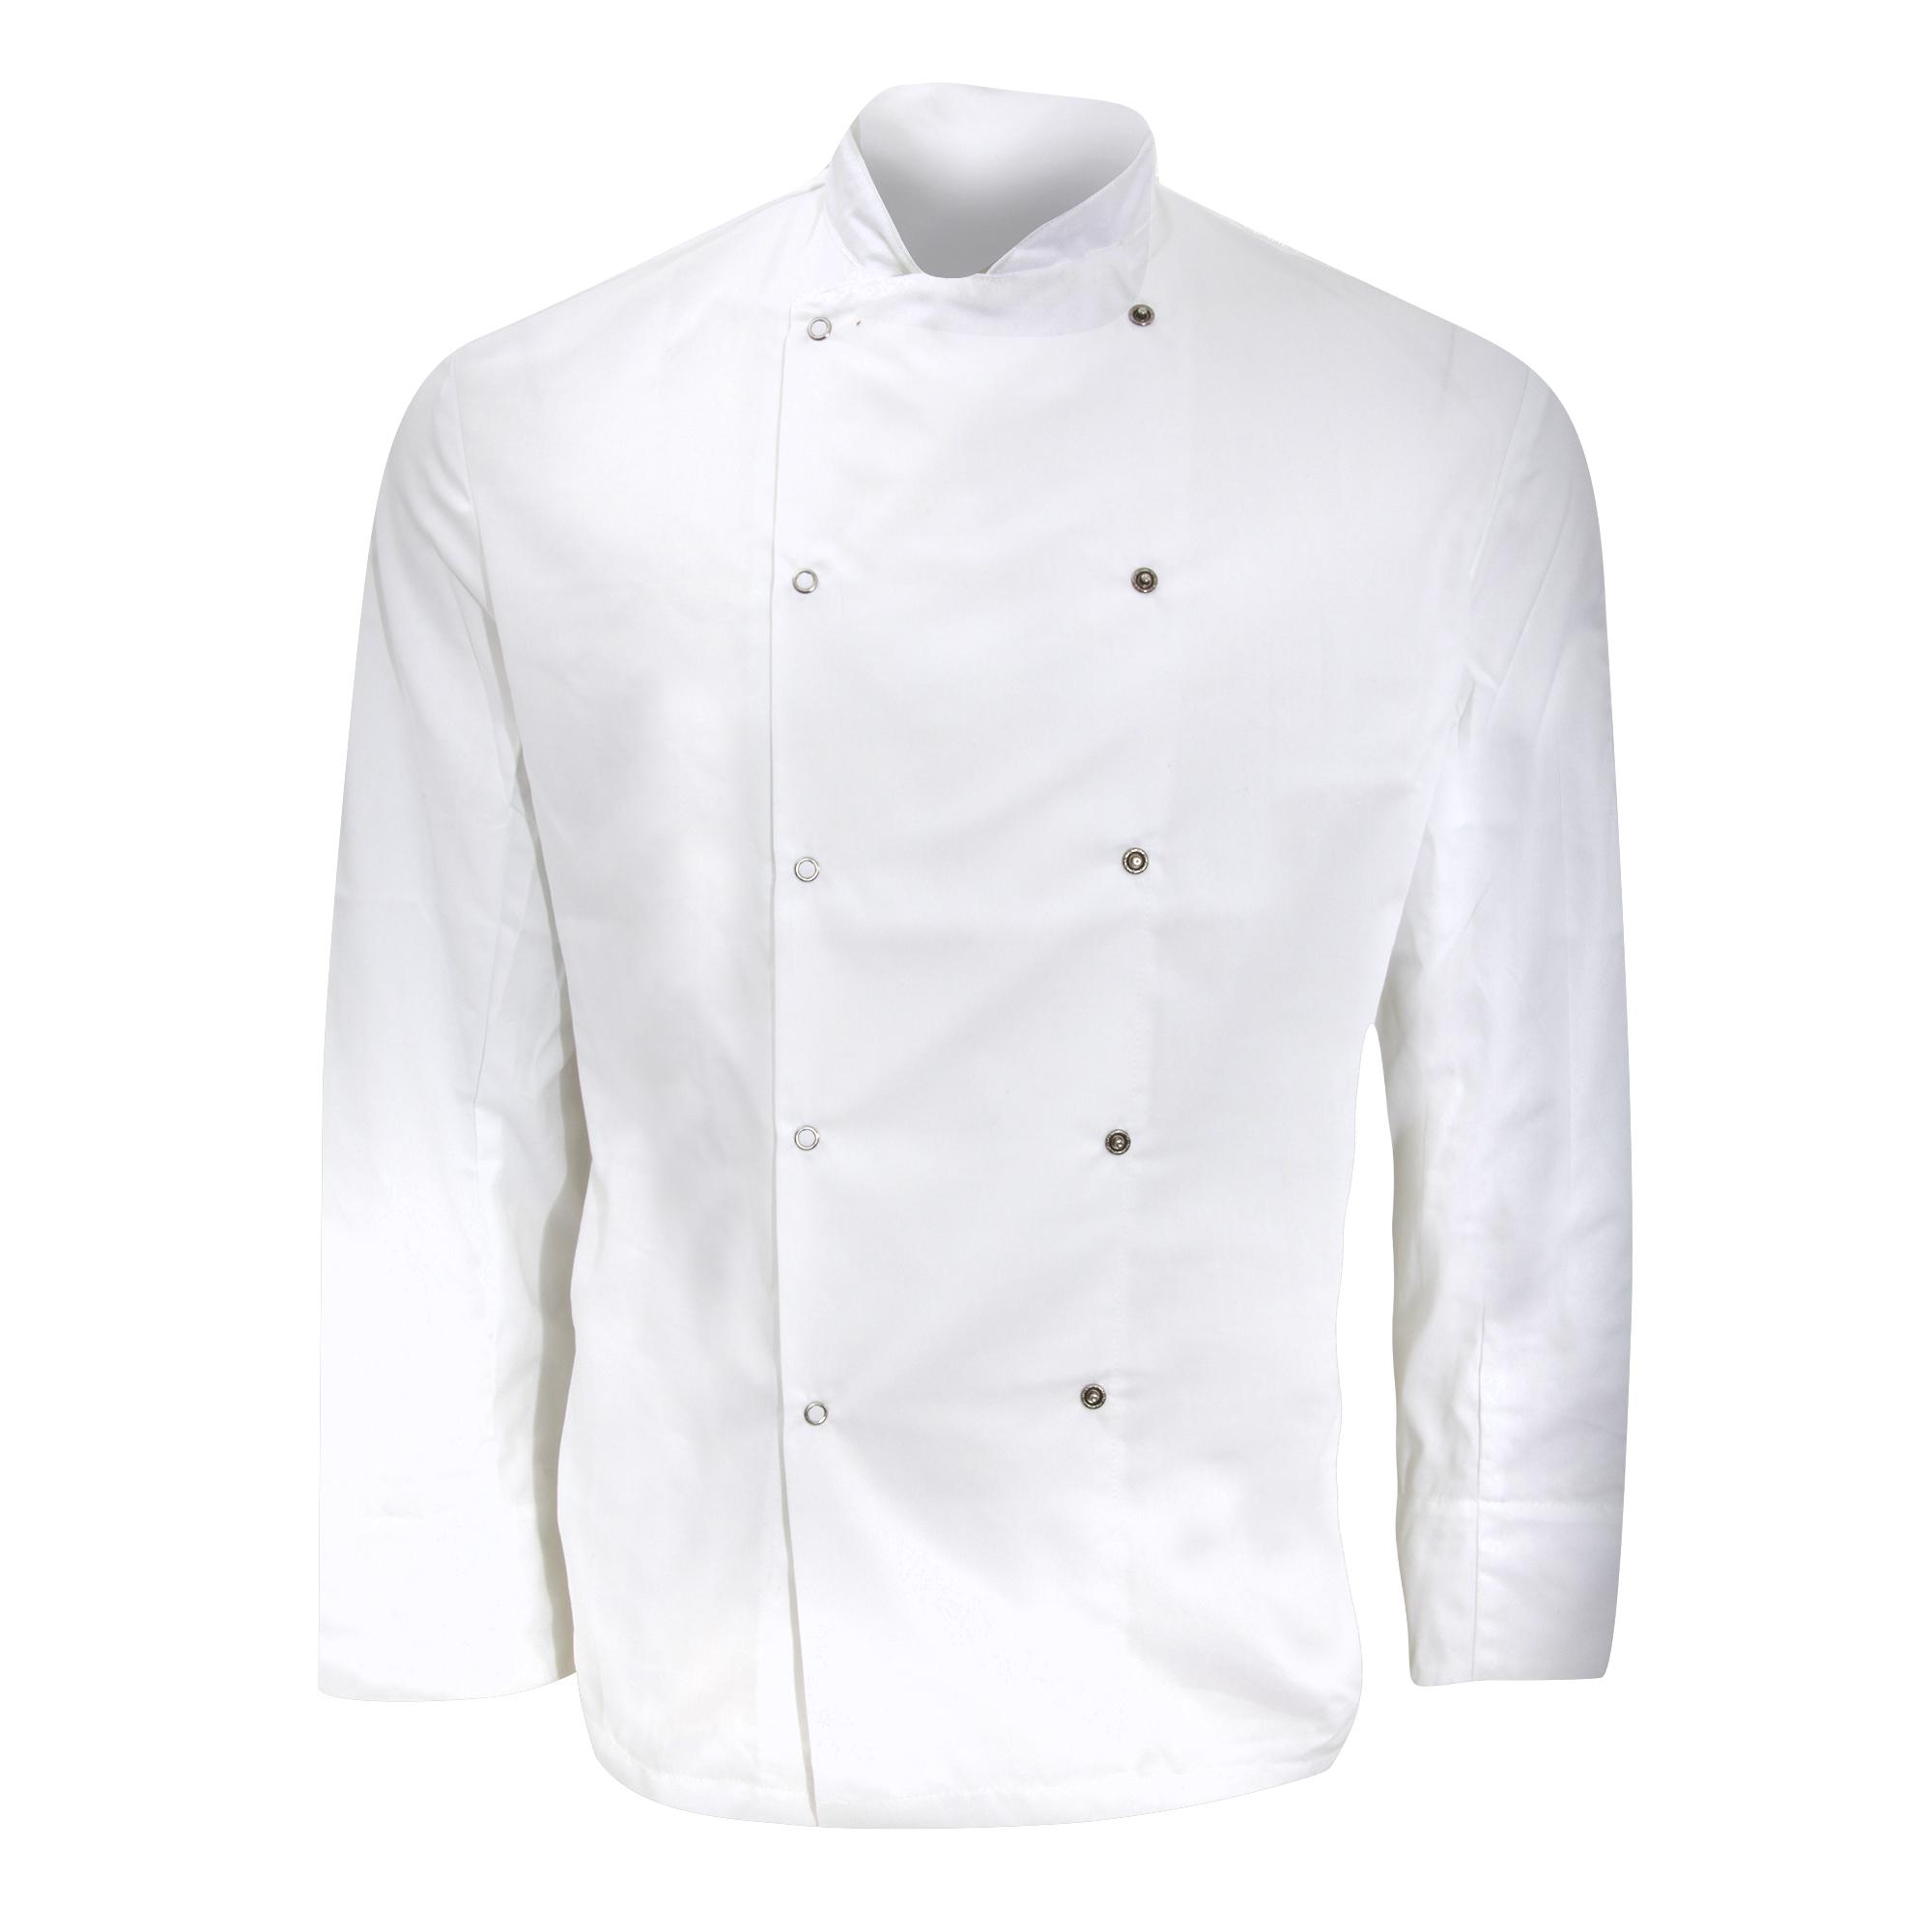 Dennys Mens Long Sleeve Chefs Jacket / Chefswear (XS) (White)